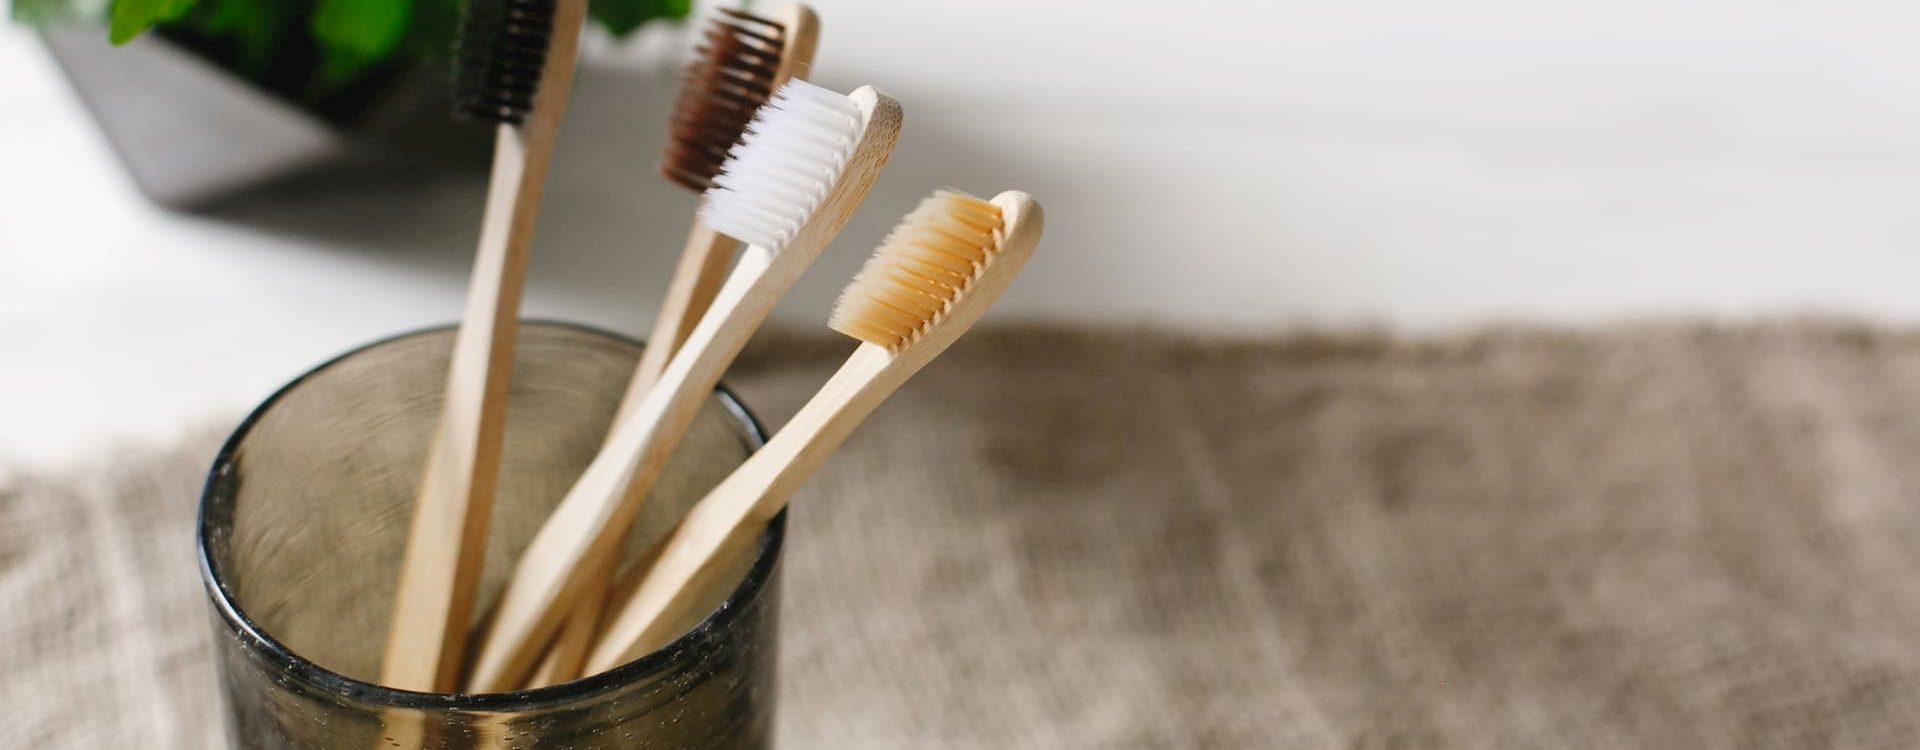 cepillos-de-dientes-de-bambu